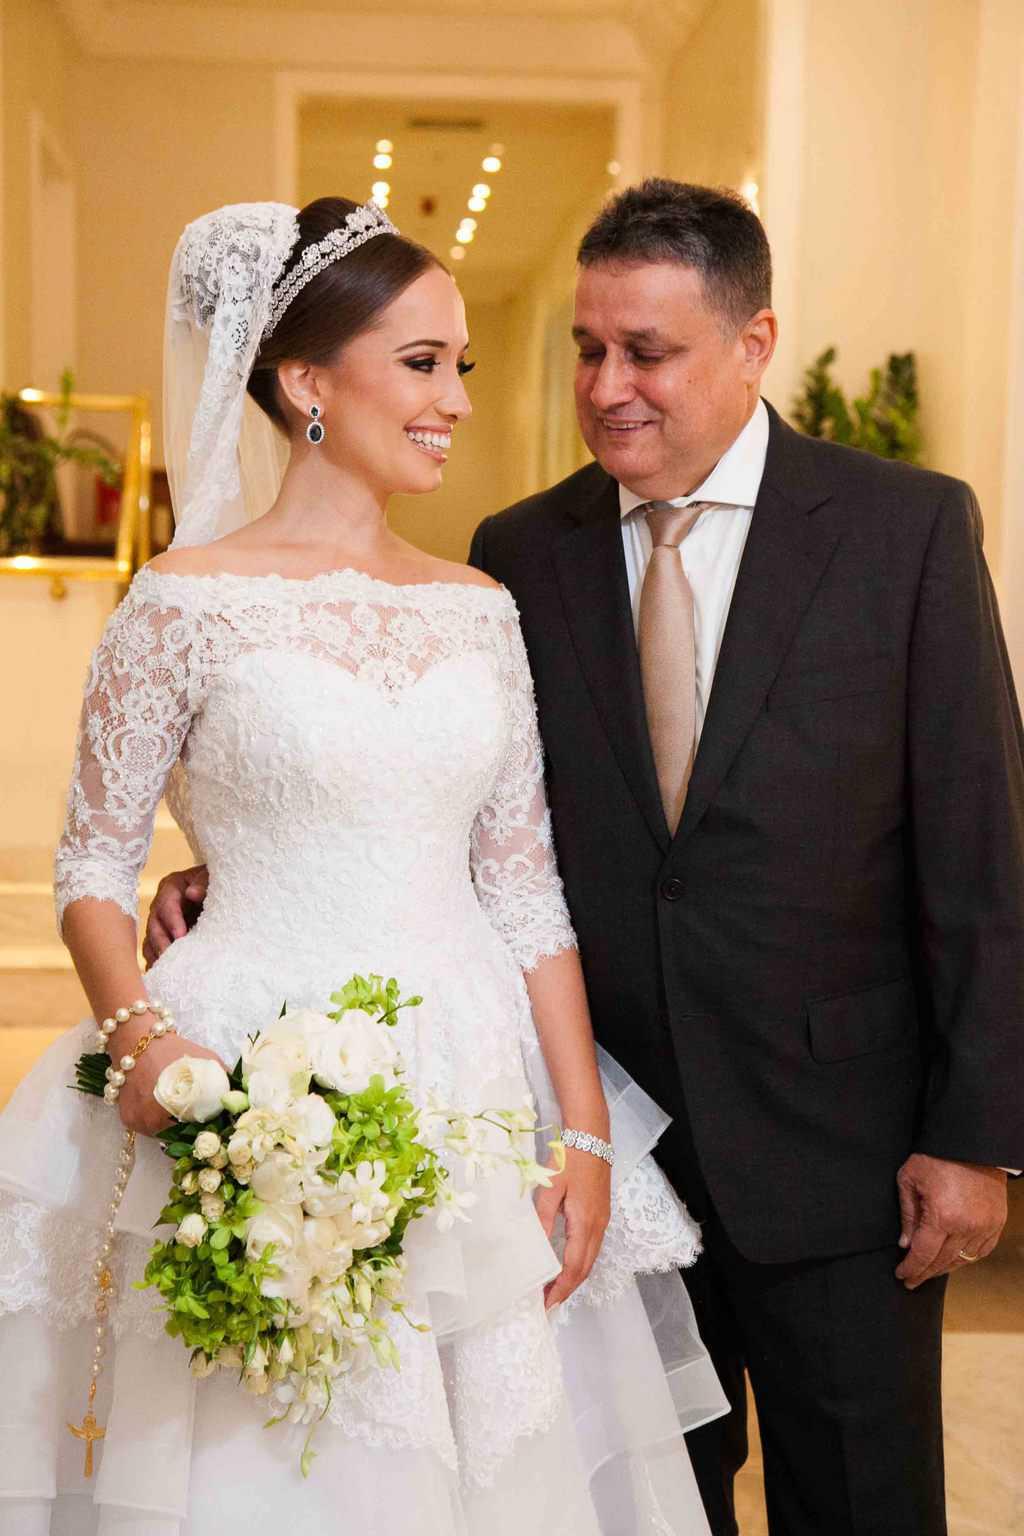 Casamento-Clássico-Casamento-tradicional-Copacabana-Palace-Monica-Roias-Noiva-e-pai-Ribas-Foto-e-Vídeo-Tuanny-e-Bernardo-CaseMe